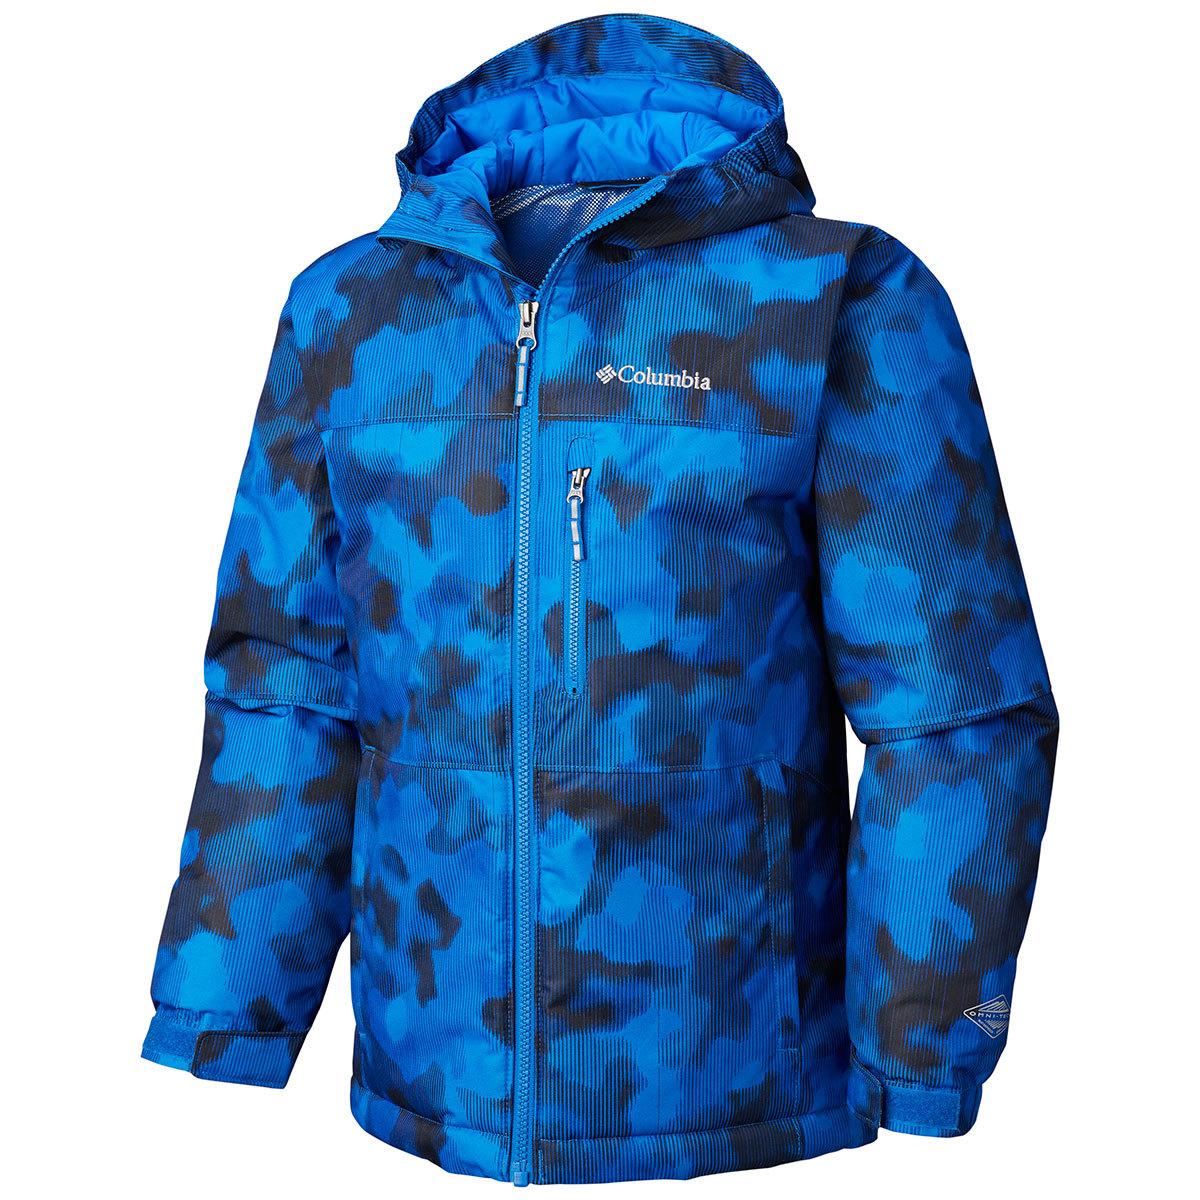 Columbia Boys' Magic Mile Jacket - Blue, S